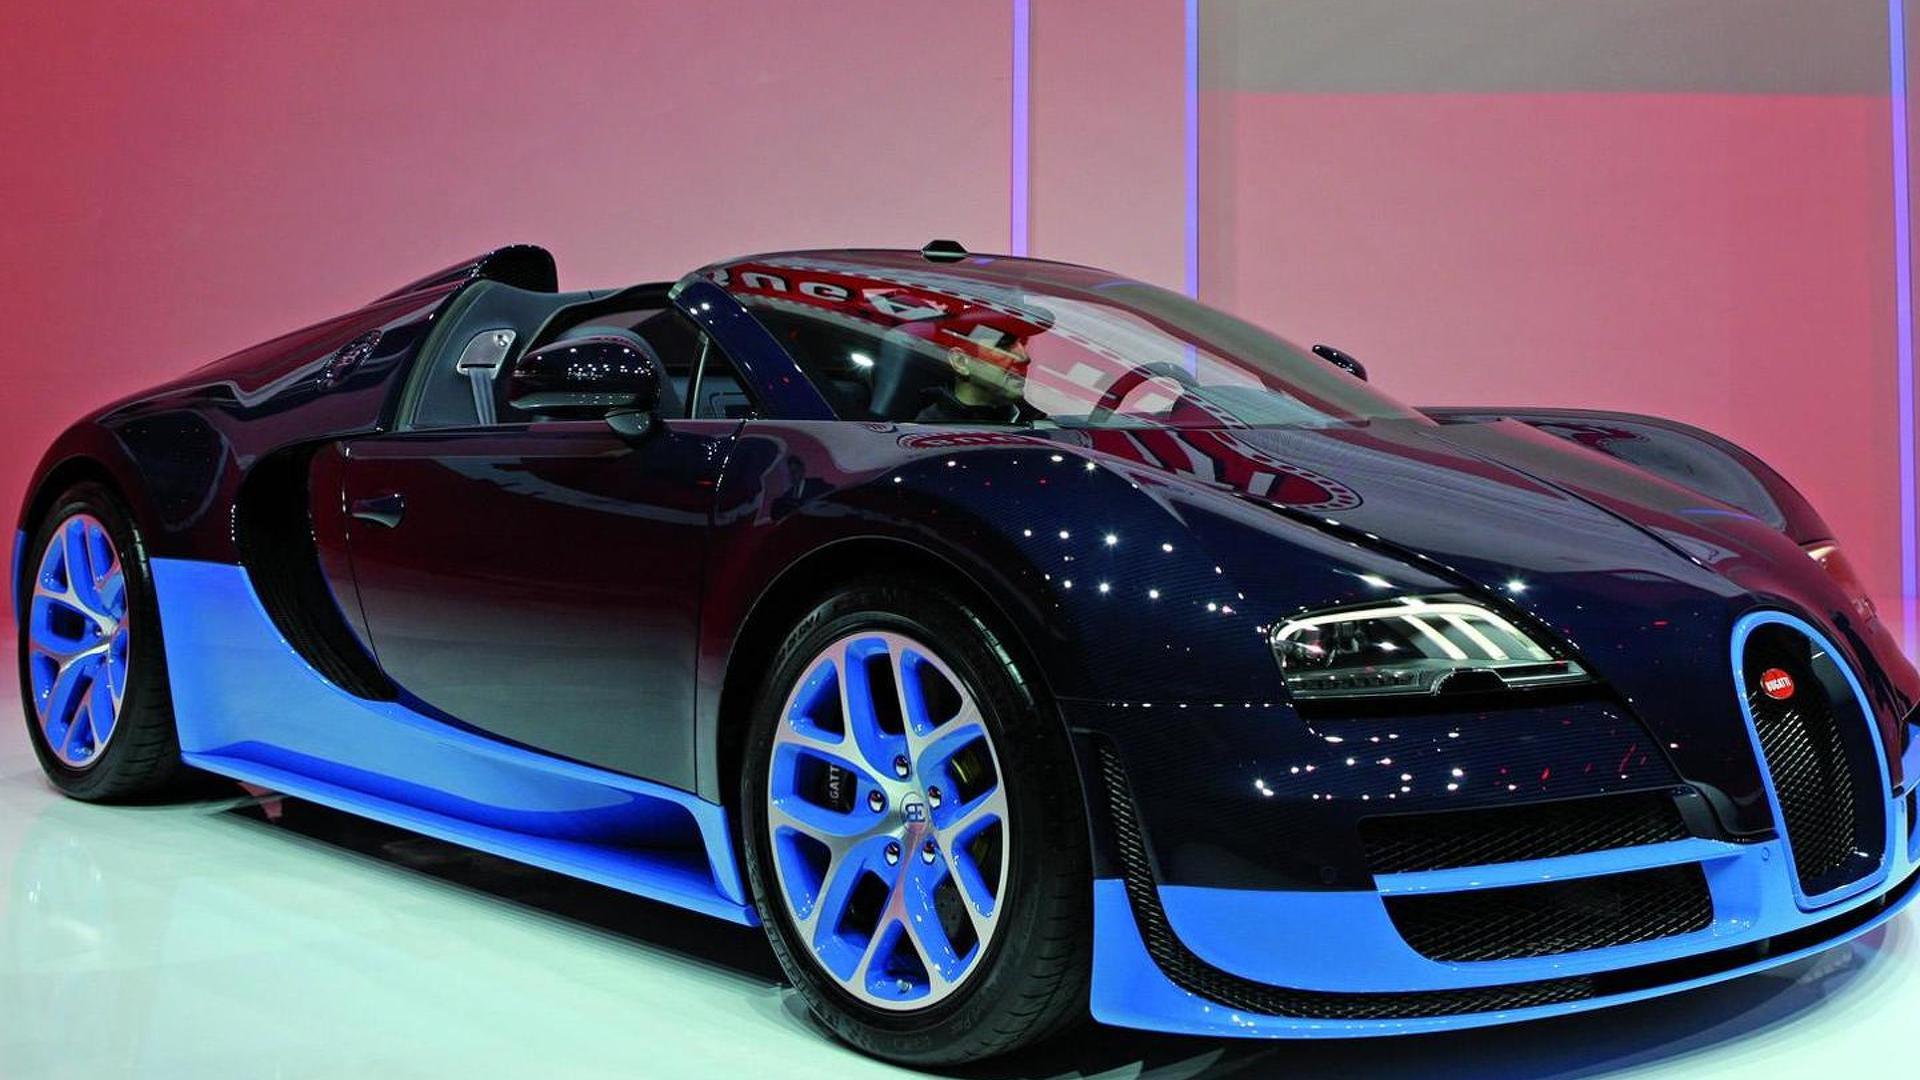 2012-301417-bugatti-veyron-grand-sport-vitesse-presentation-in-geneva1 Amazing Bugatti Veyron Grand Sport Vitesse Information Cars Trend